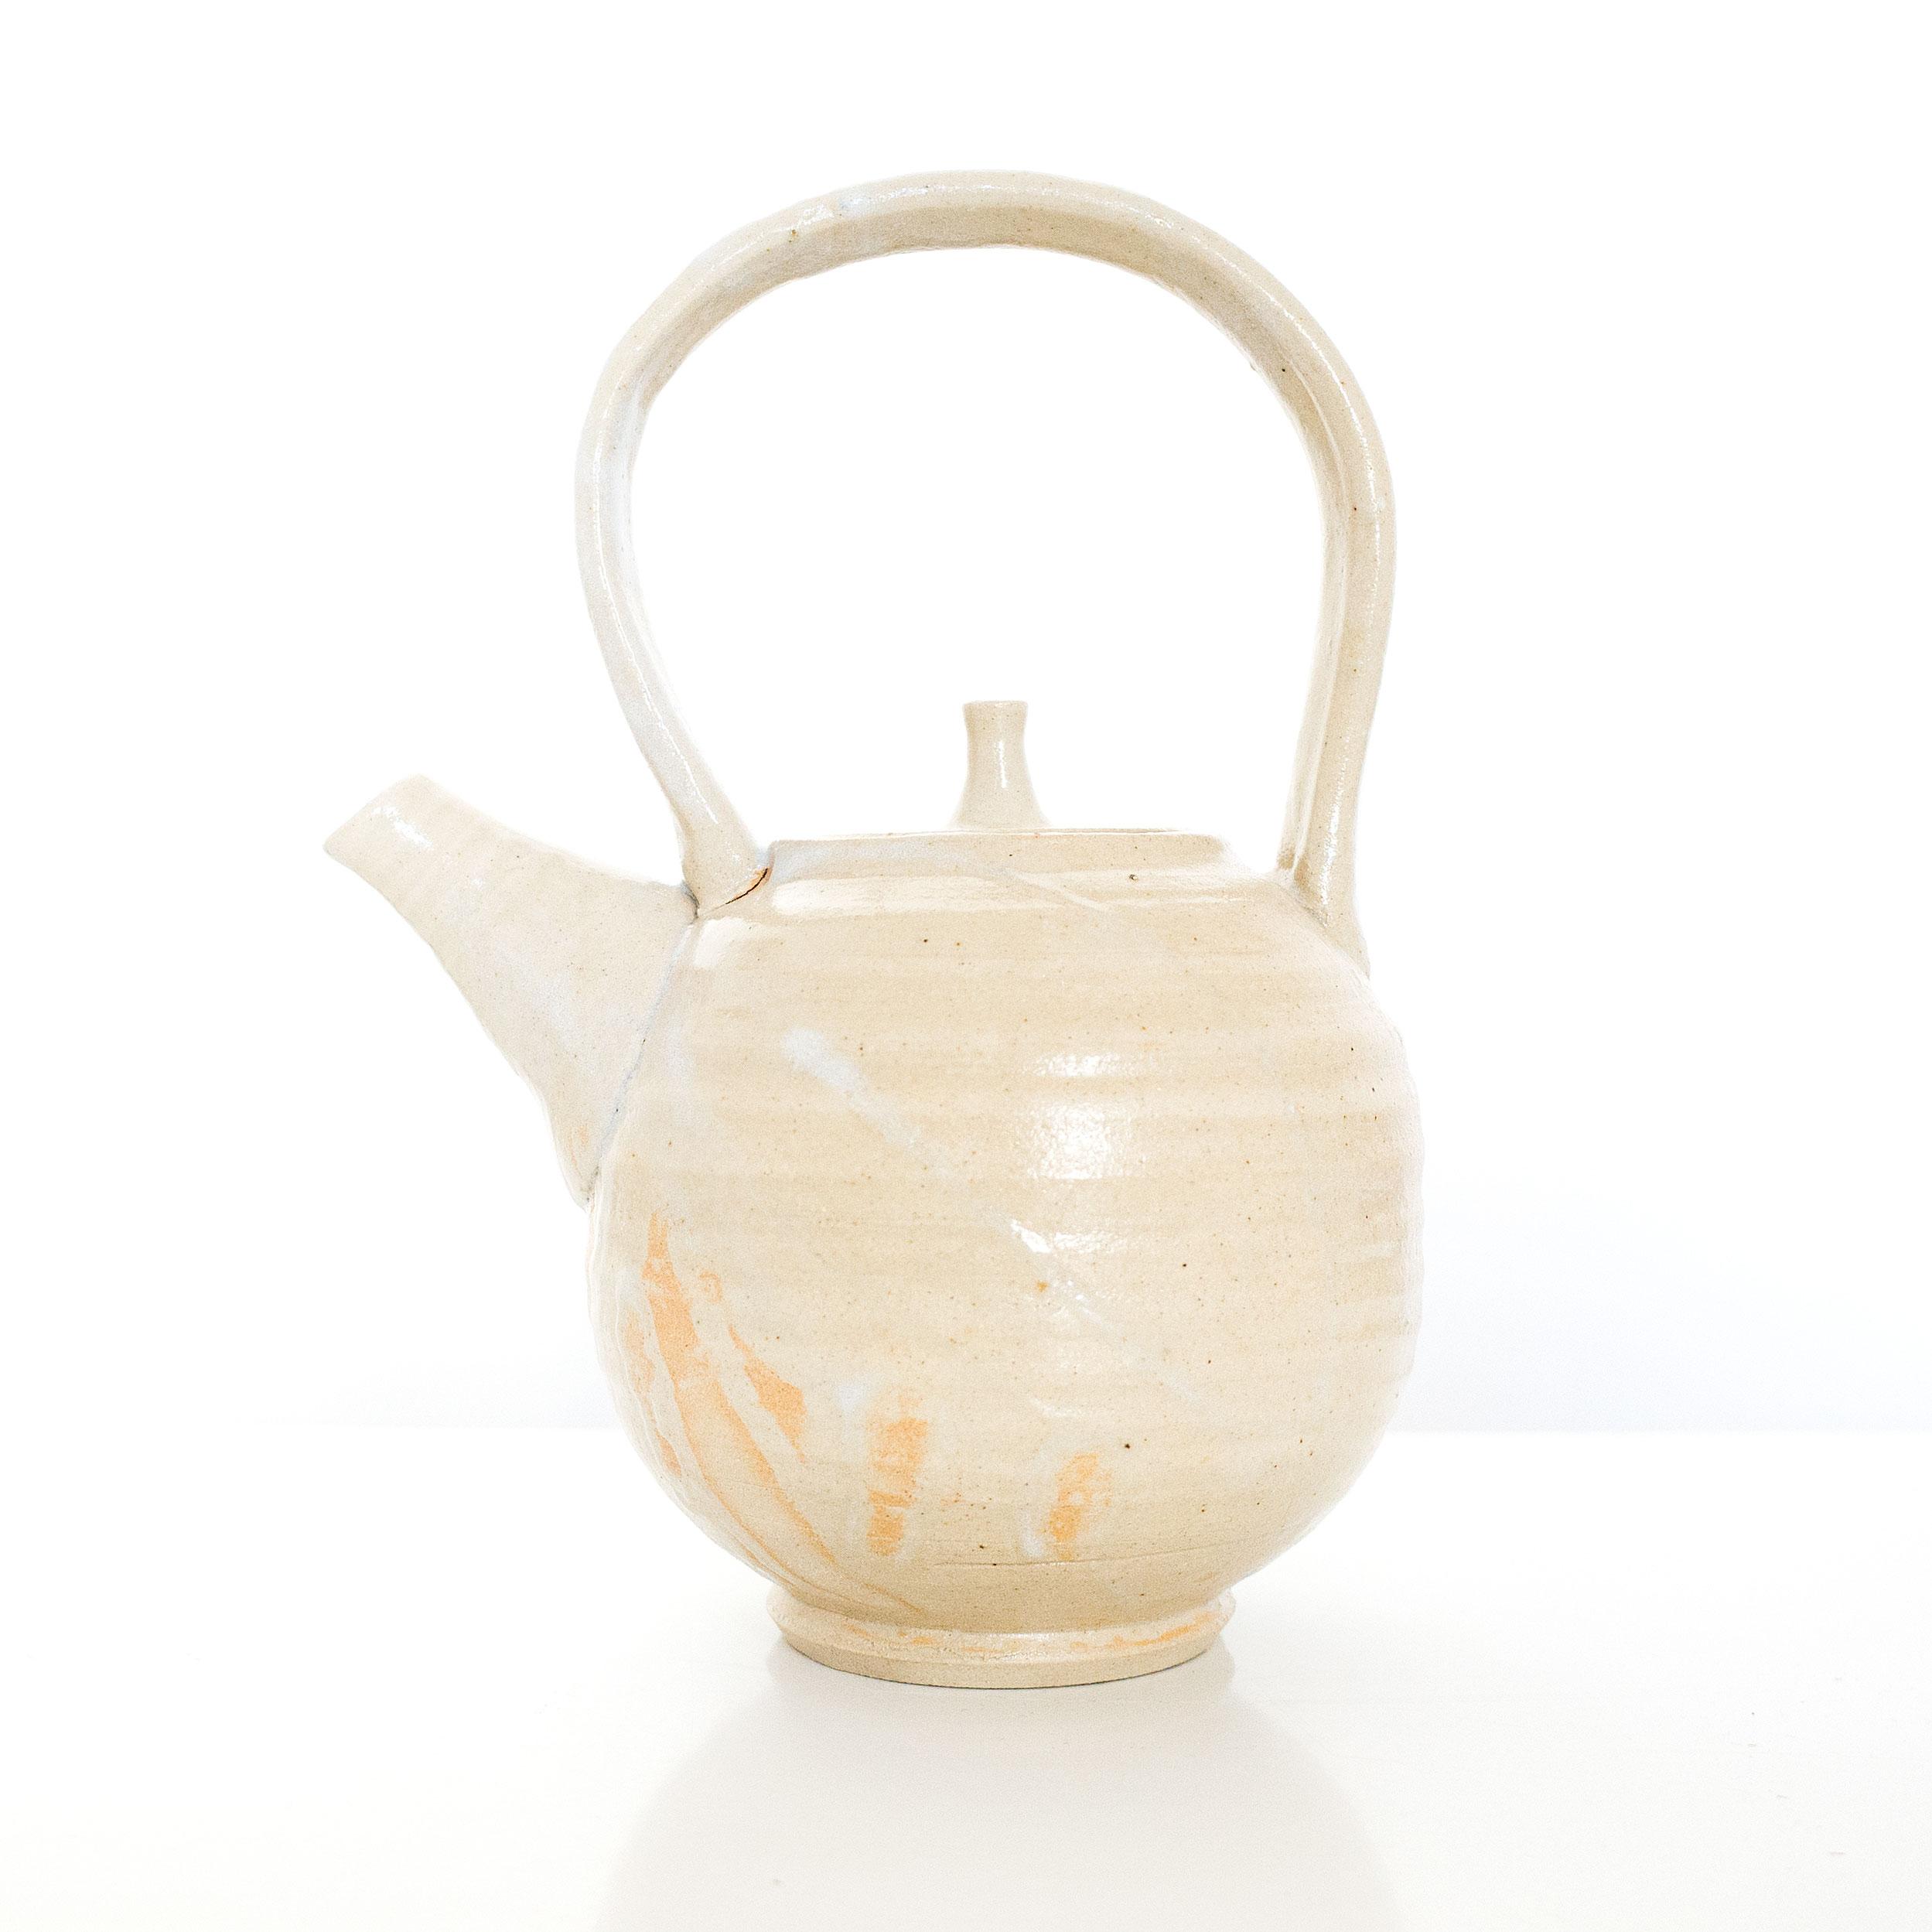 Handmade ceramic teapot by Erik Haugsby Pottery